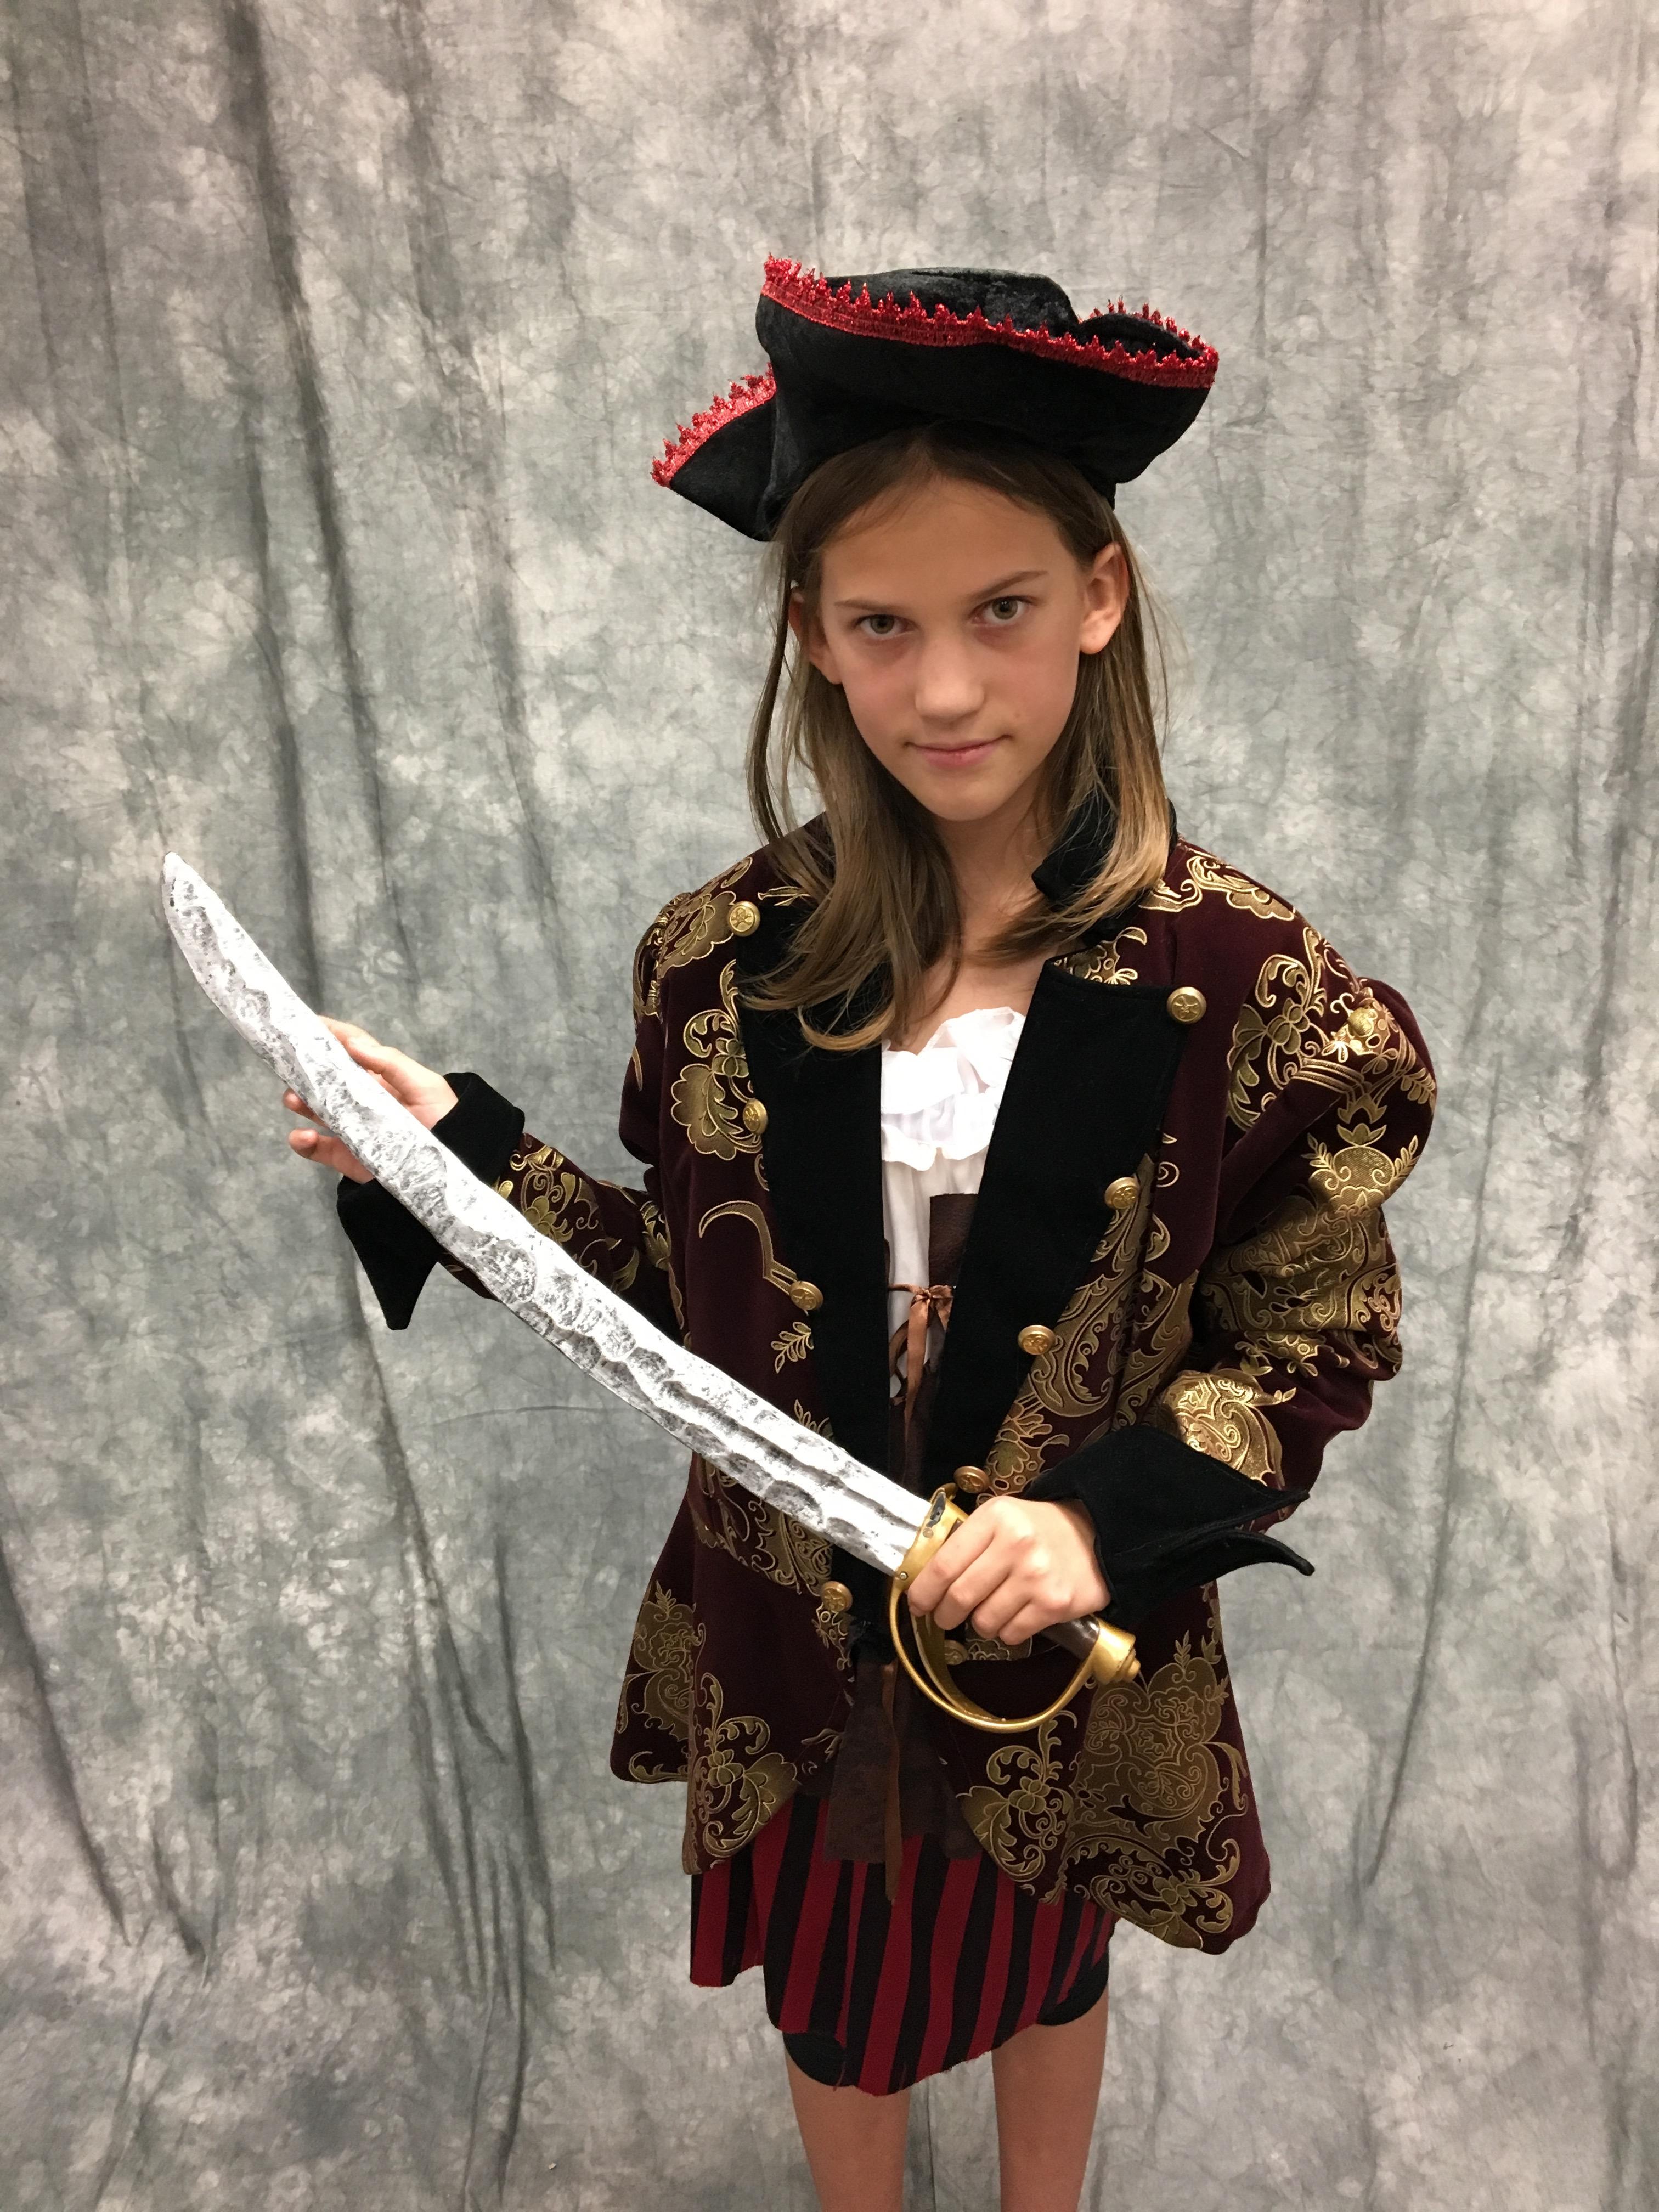 Pirate Female Costume vs2